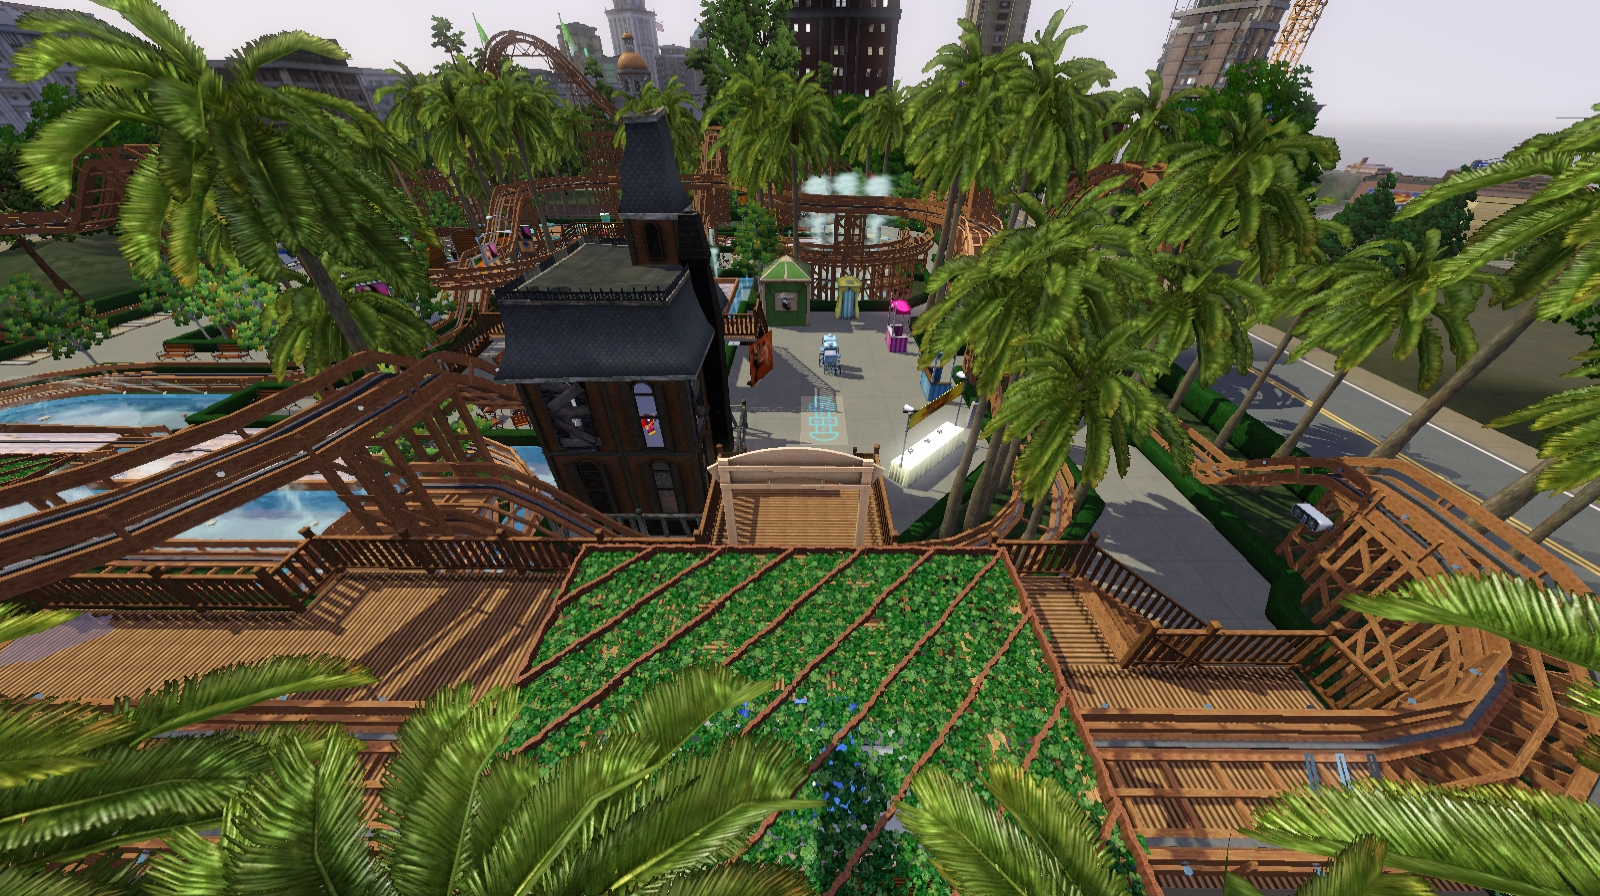 [Descarga] Parque Adventure Park. Screenshot-51